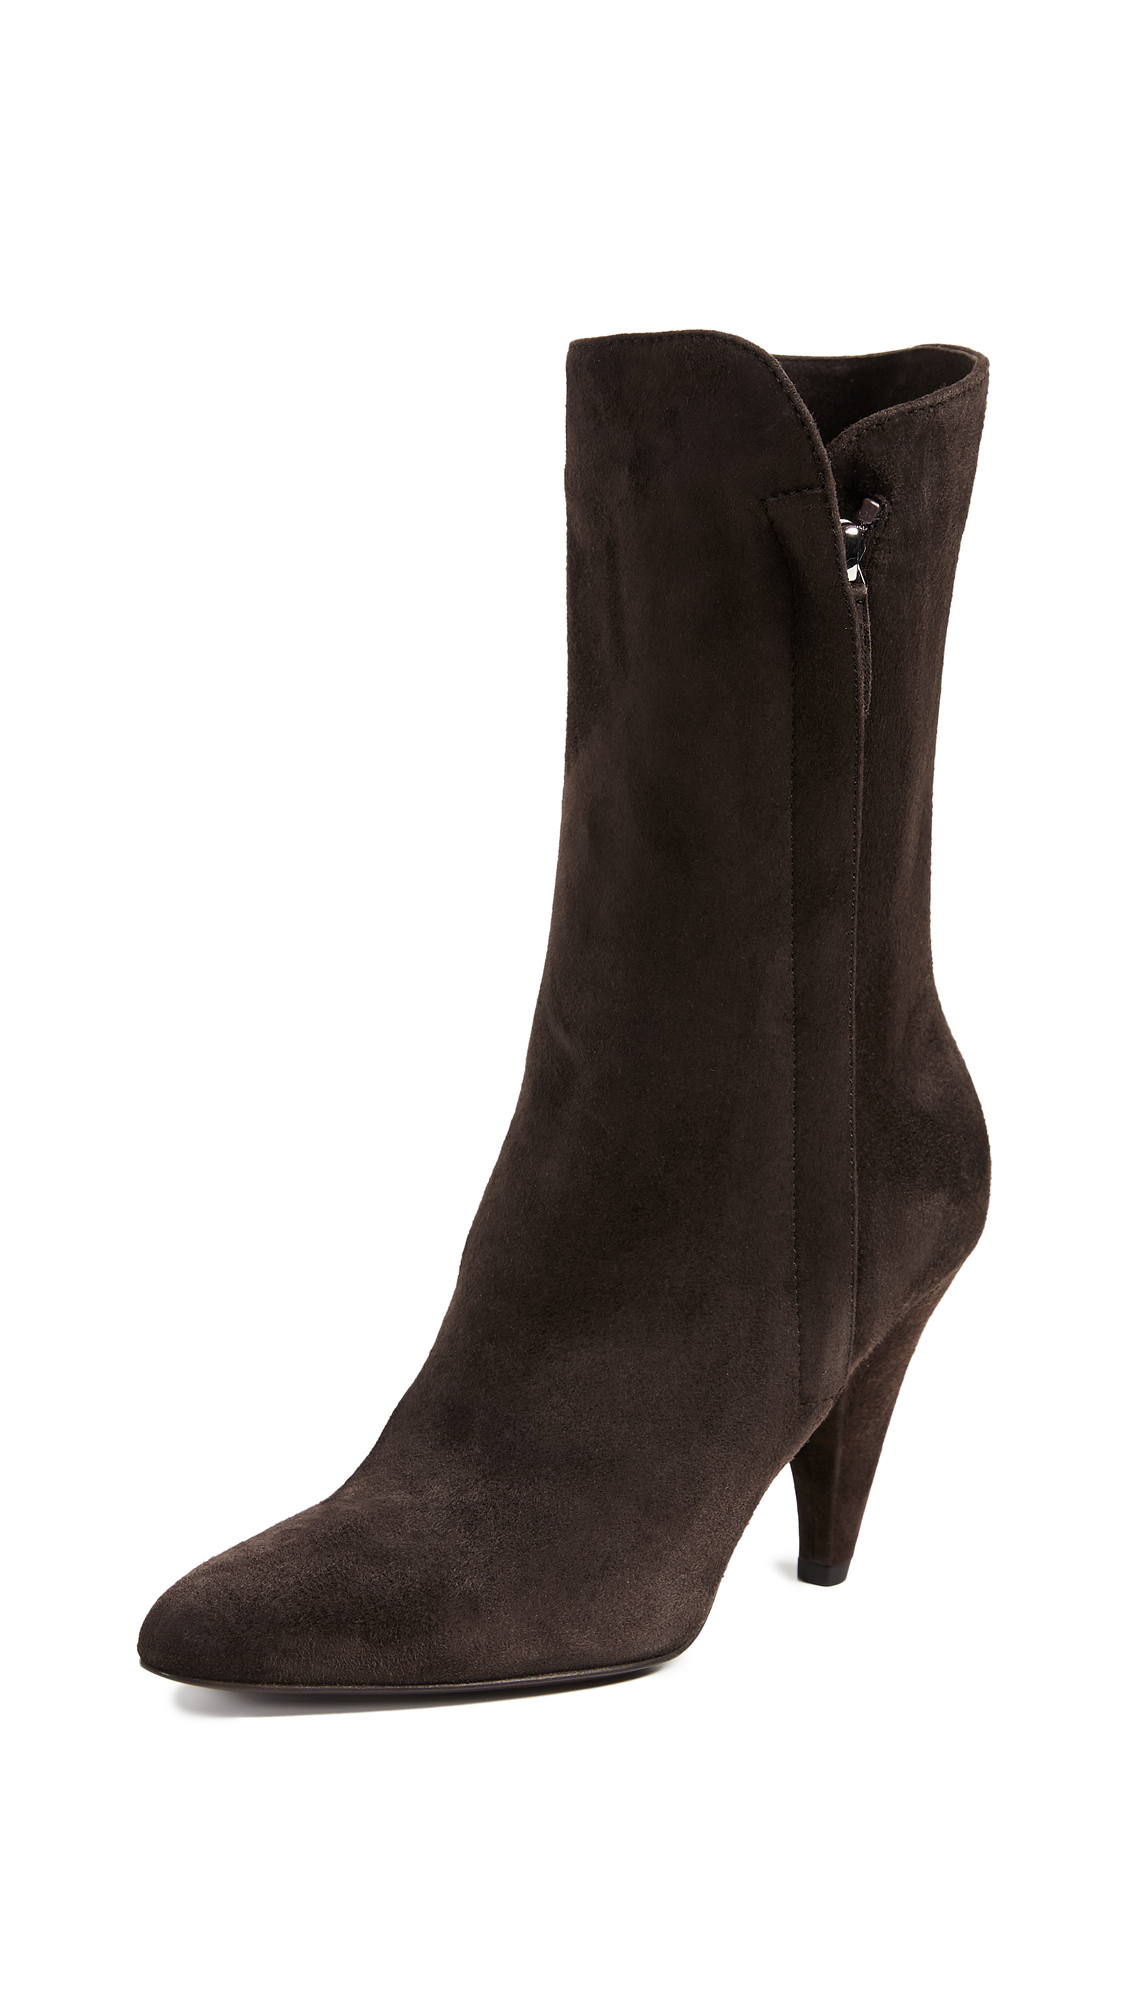 Laurence Dacade Satya Boots - Brown